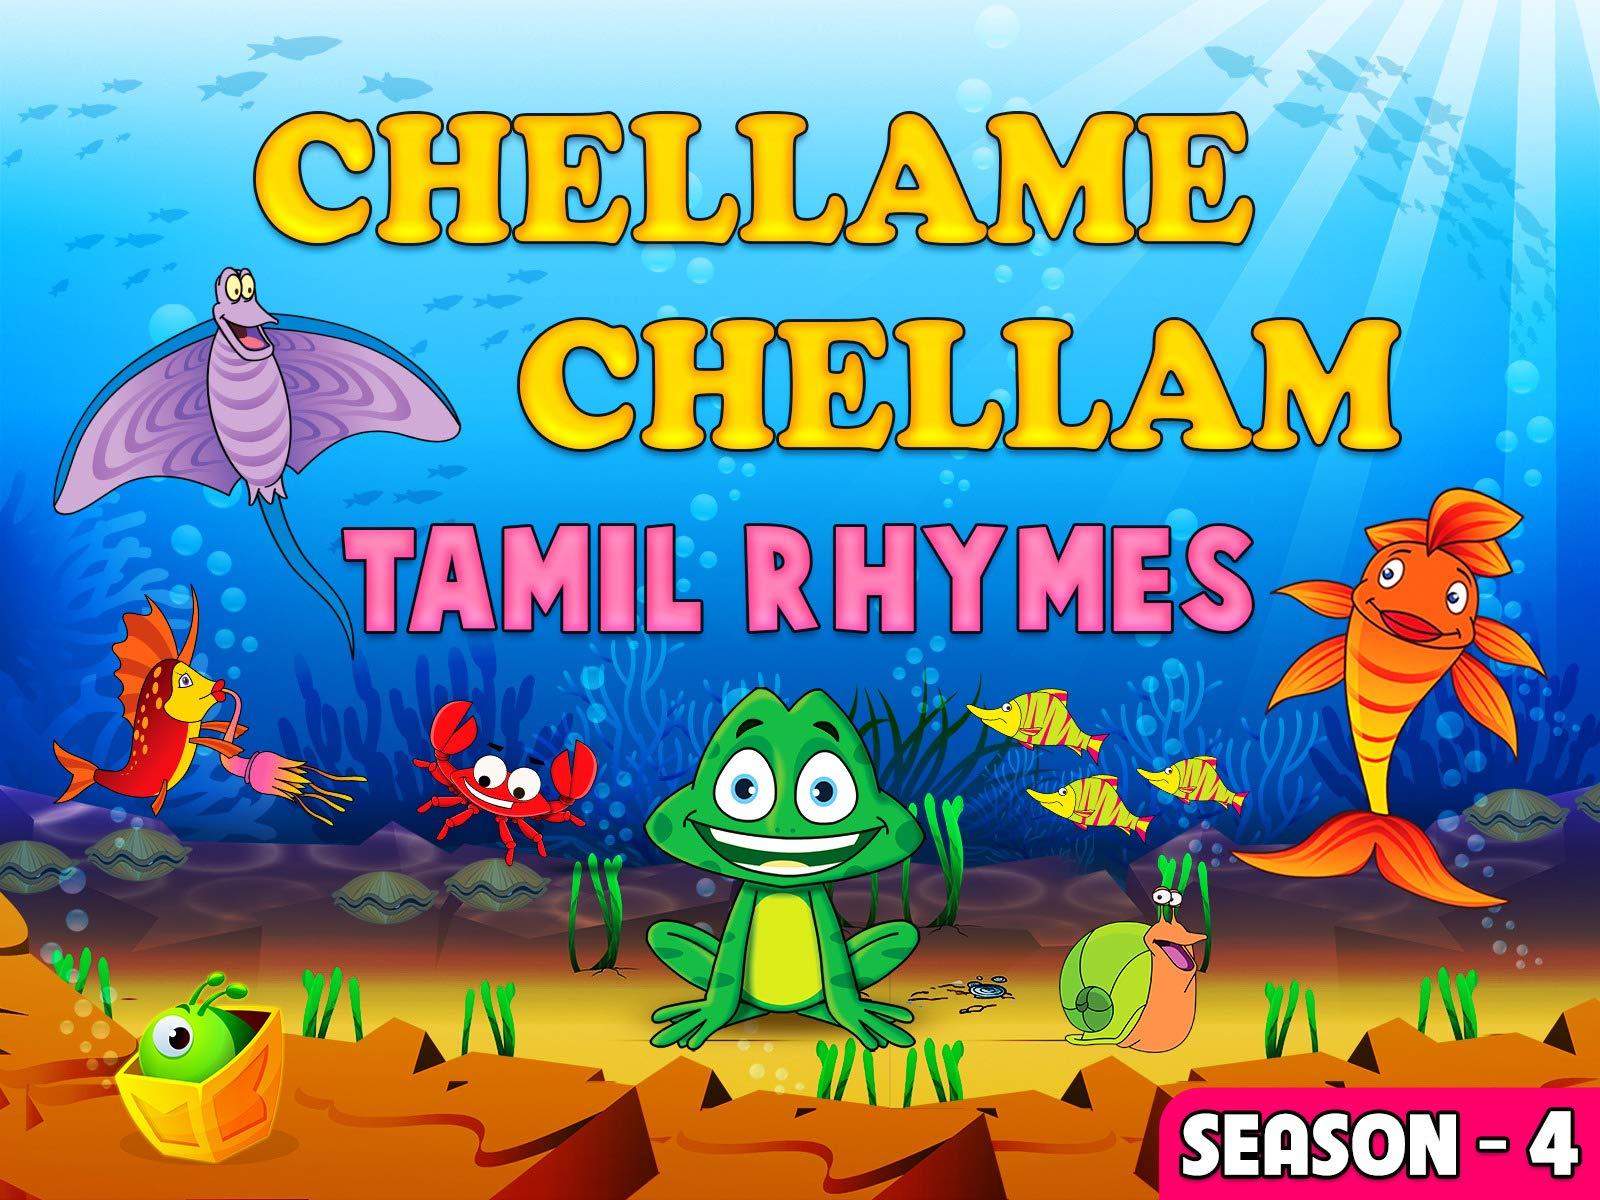 Chellame Chellam - Season 4